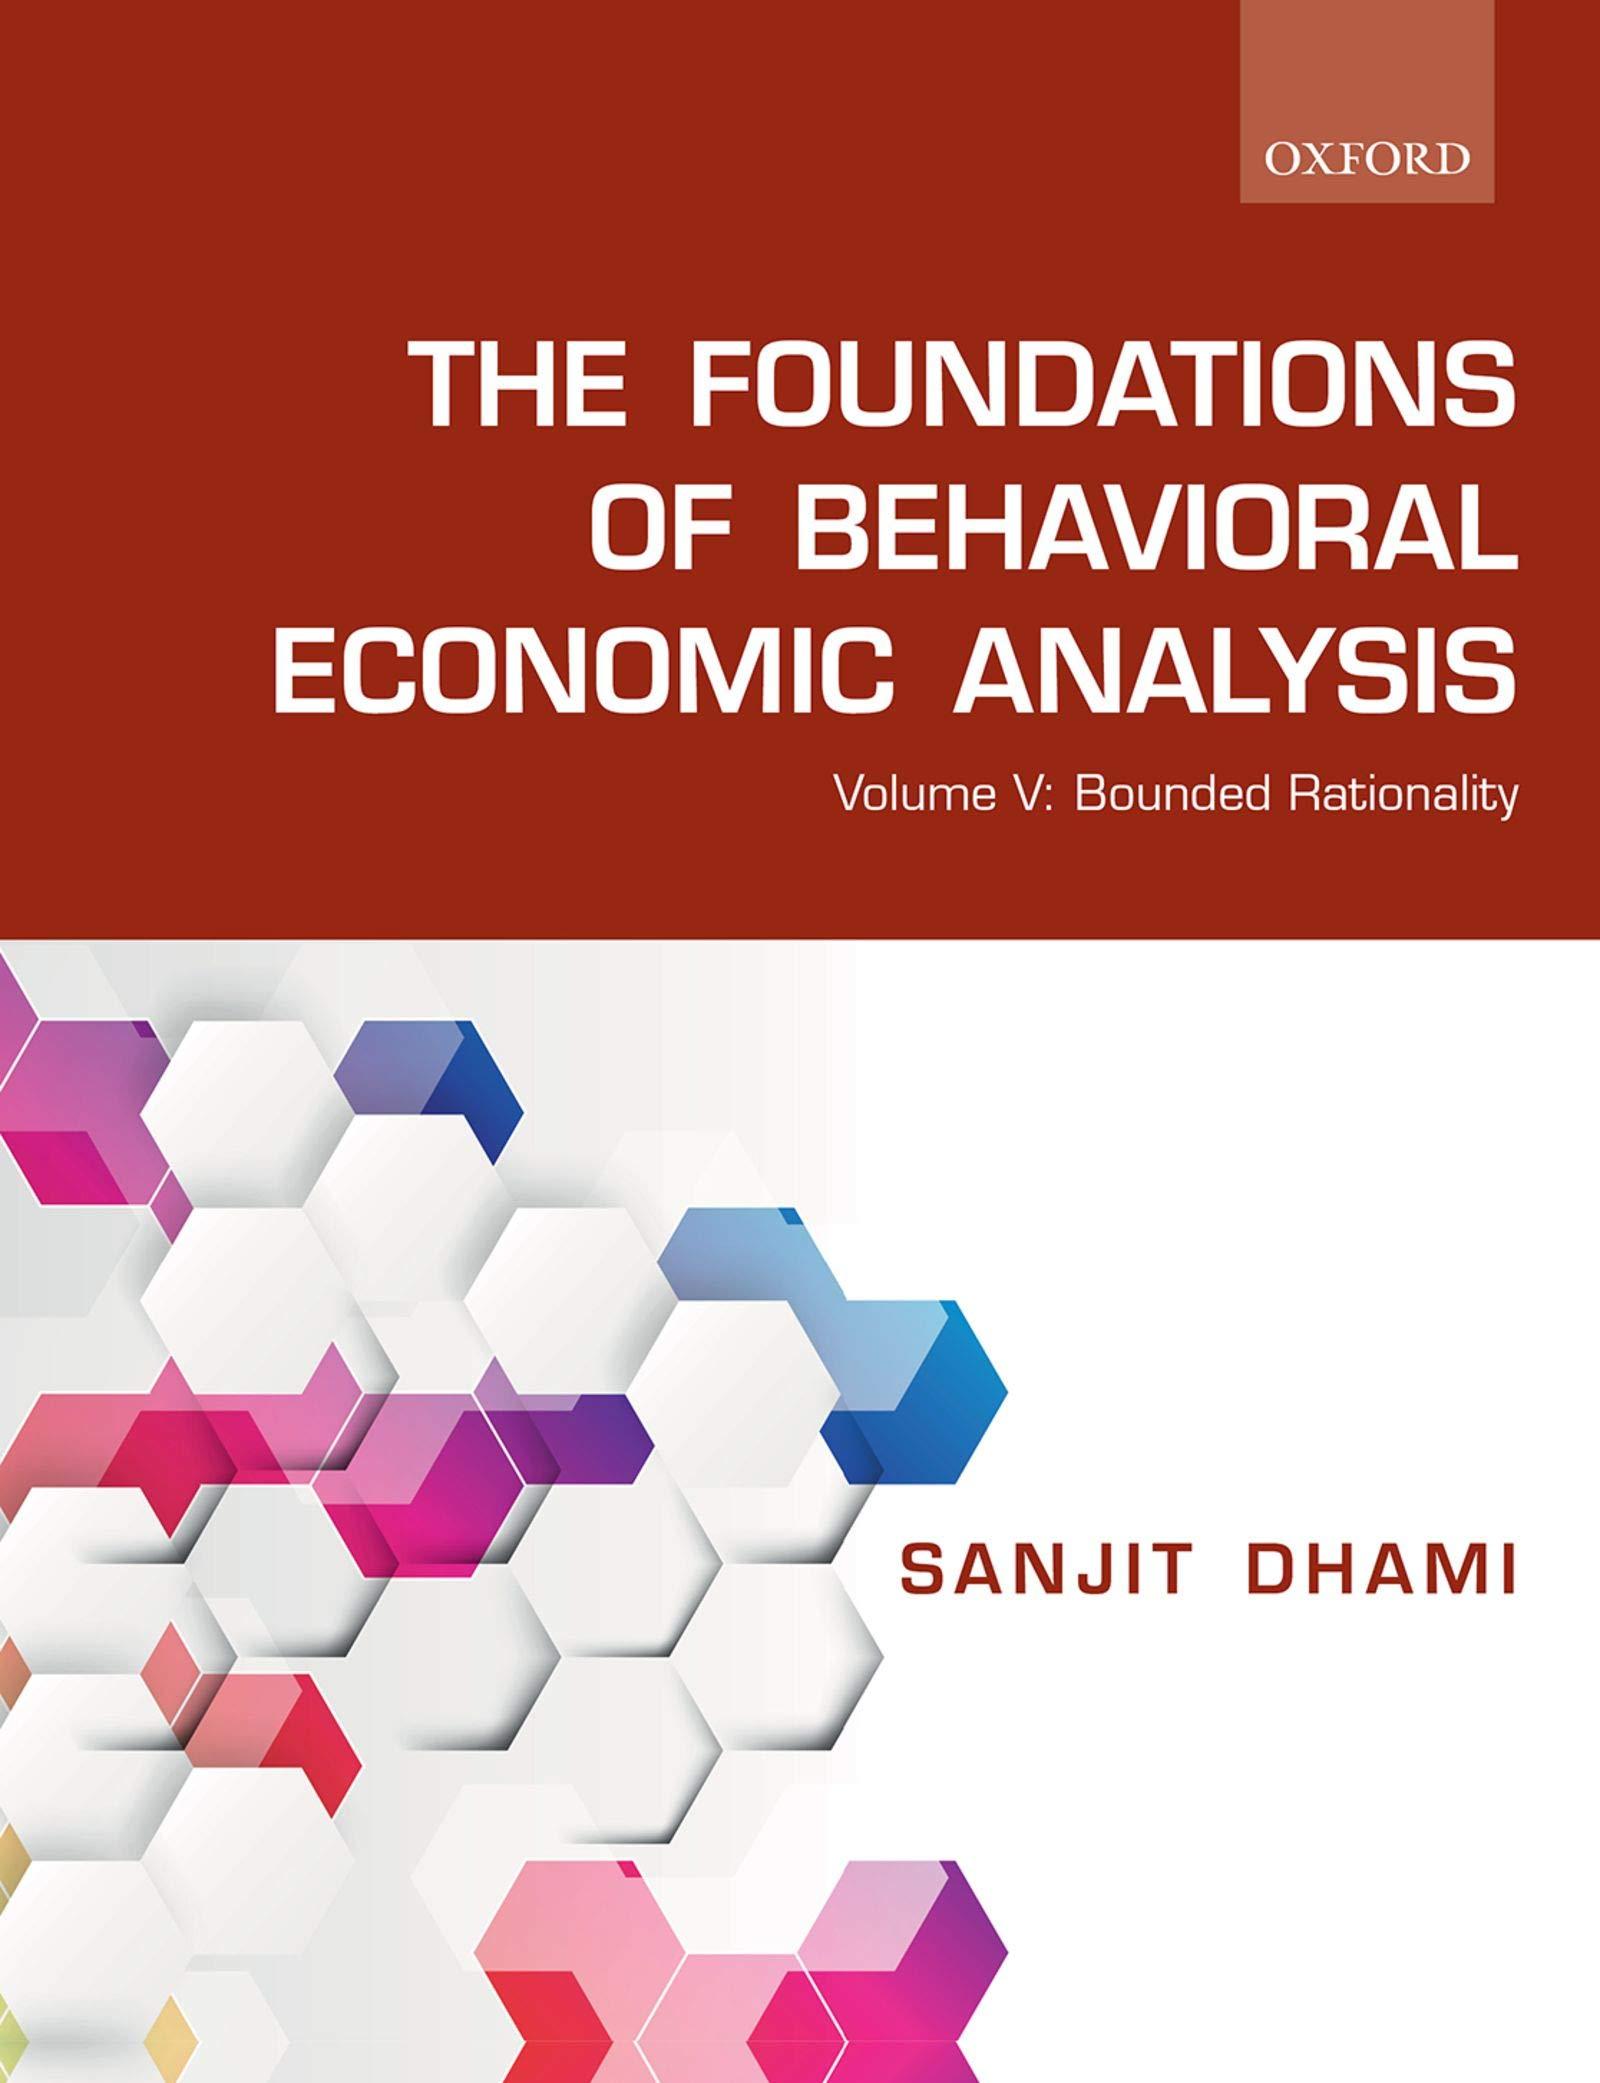 The Foundations of Behavioral Economic Analysis: Volume V: Bounded Rationality